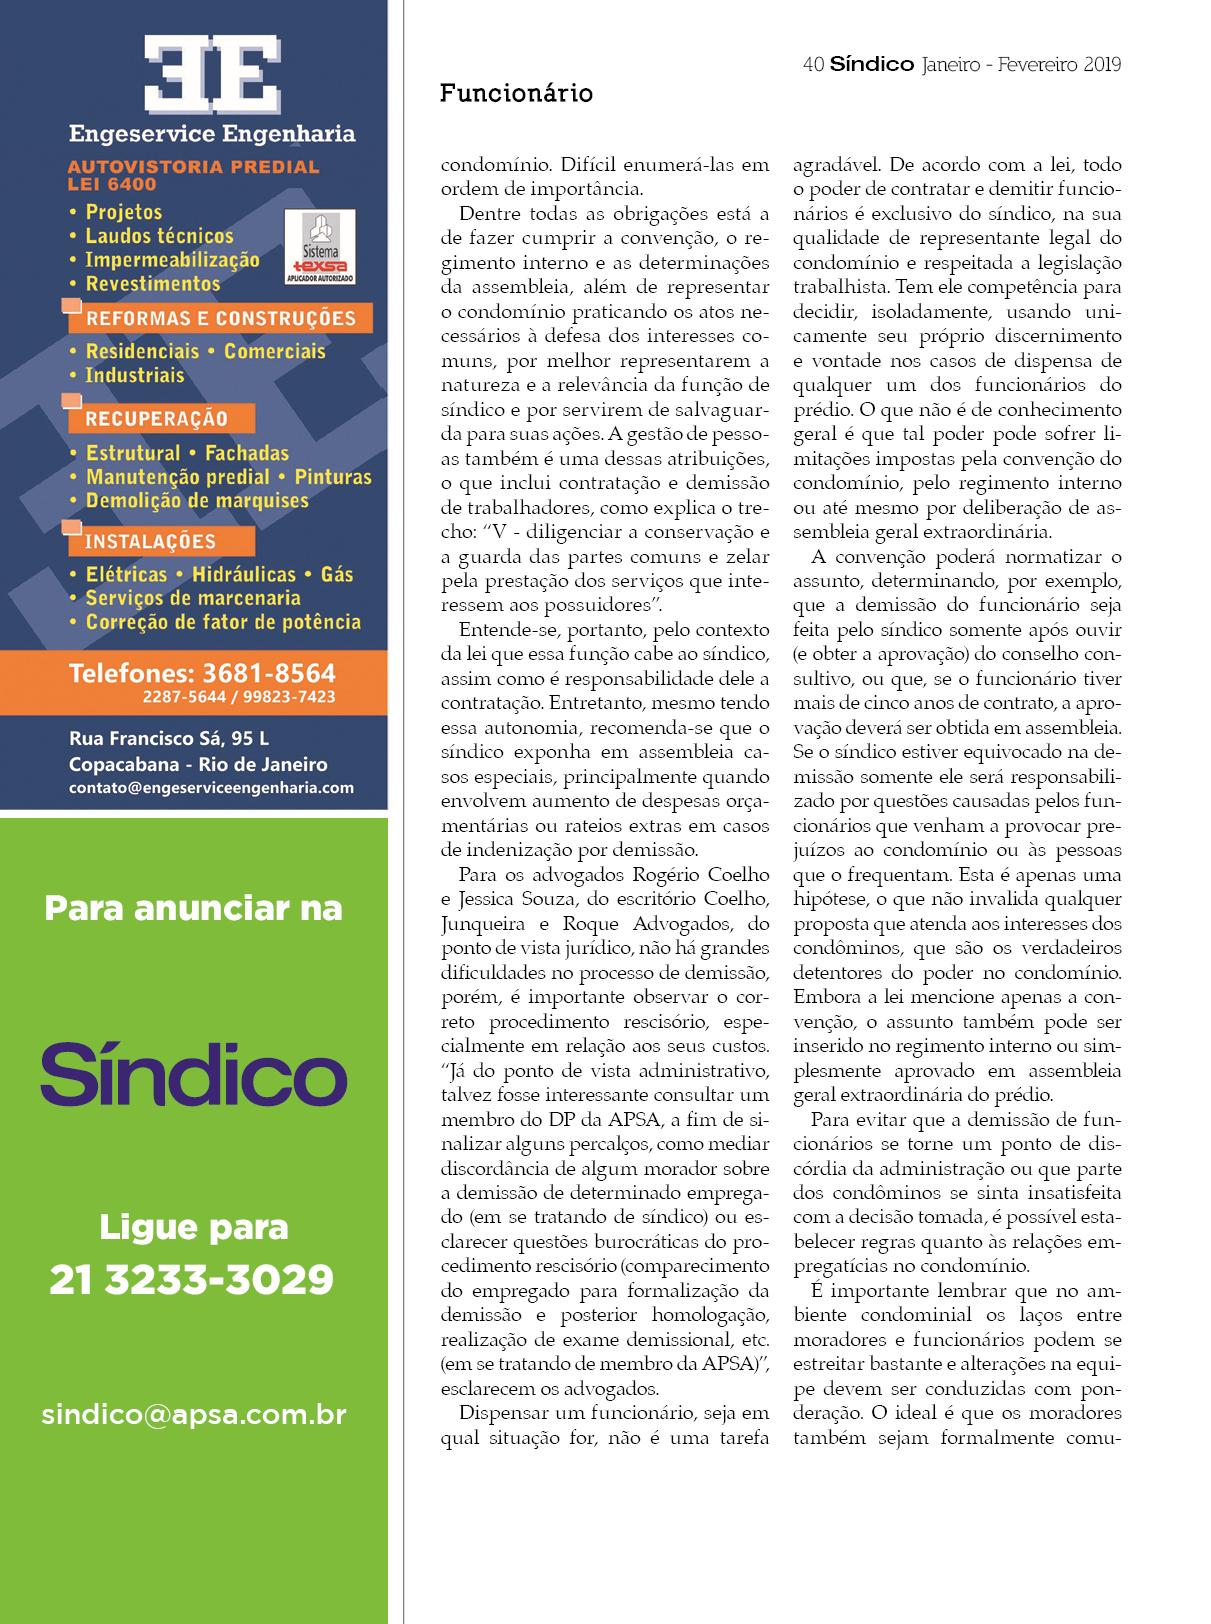 Revista Síndico_ed 242_38